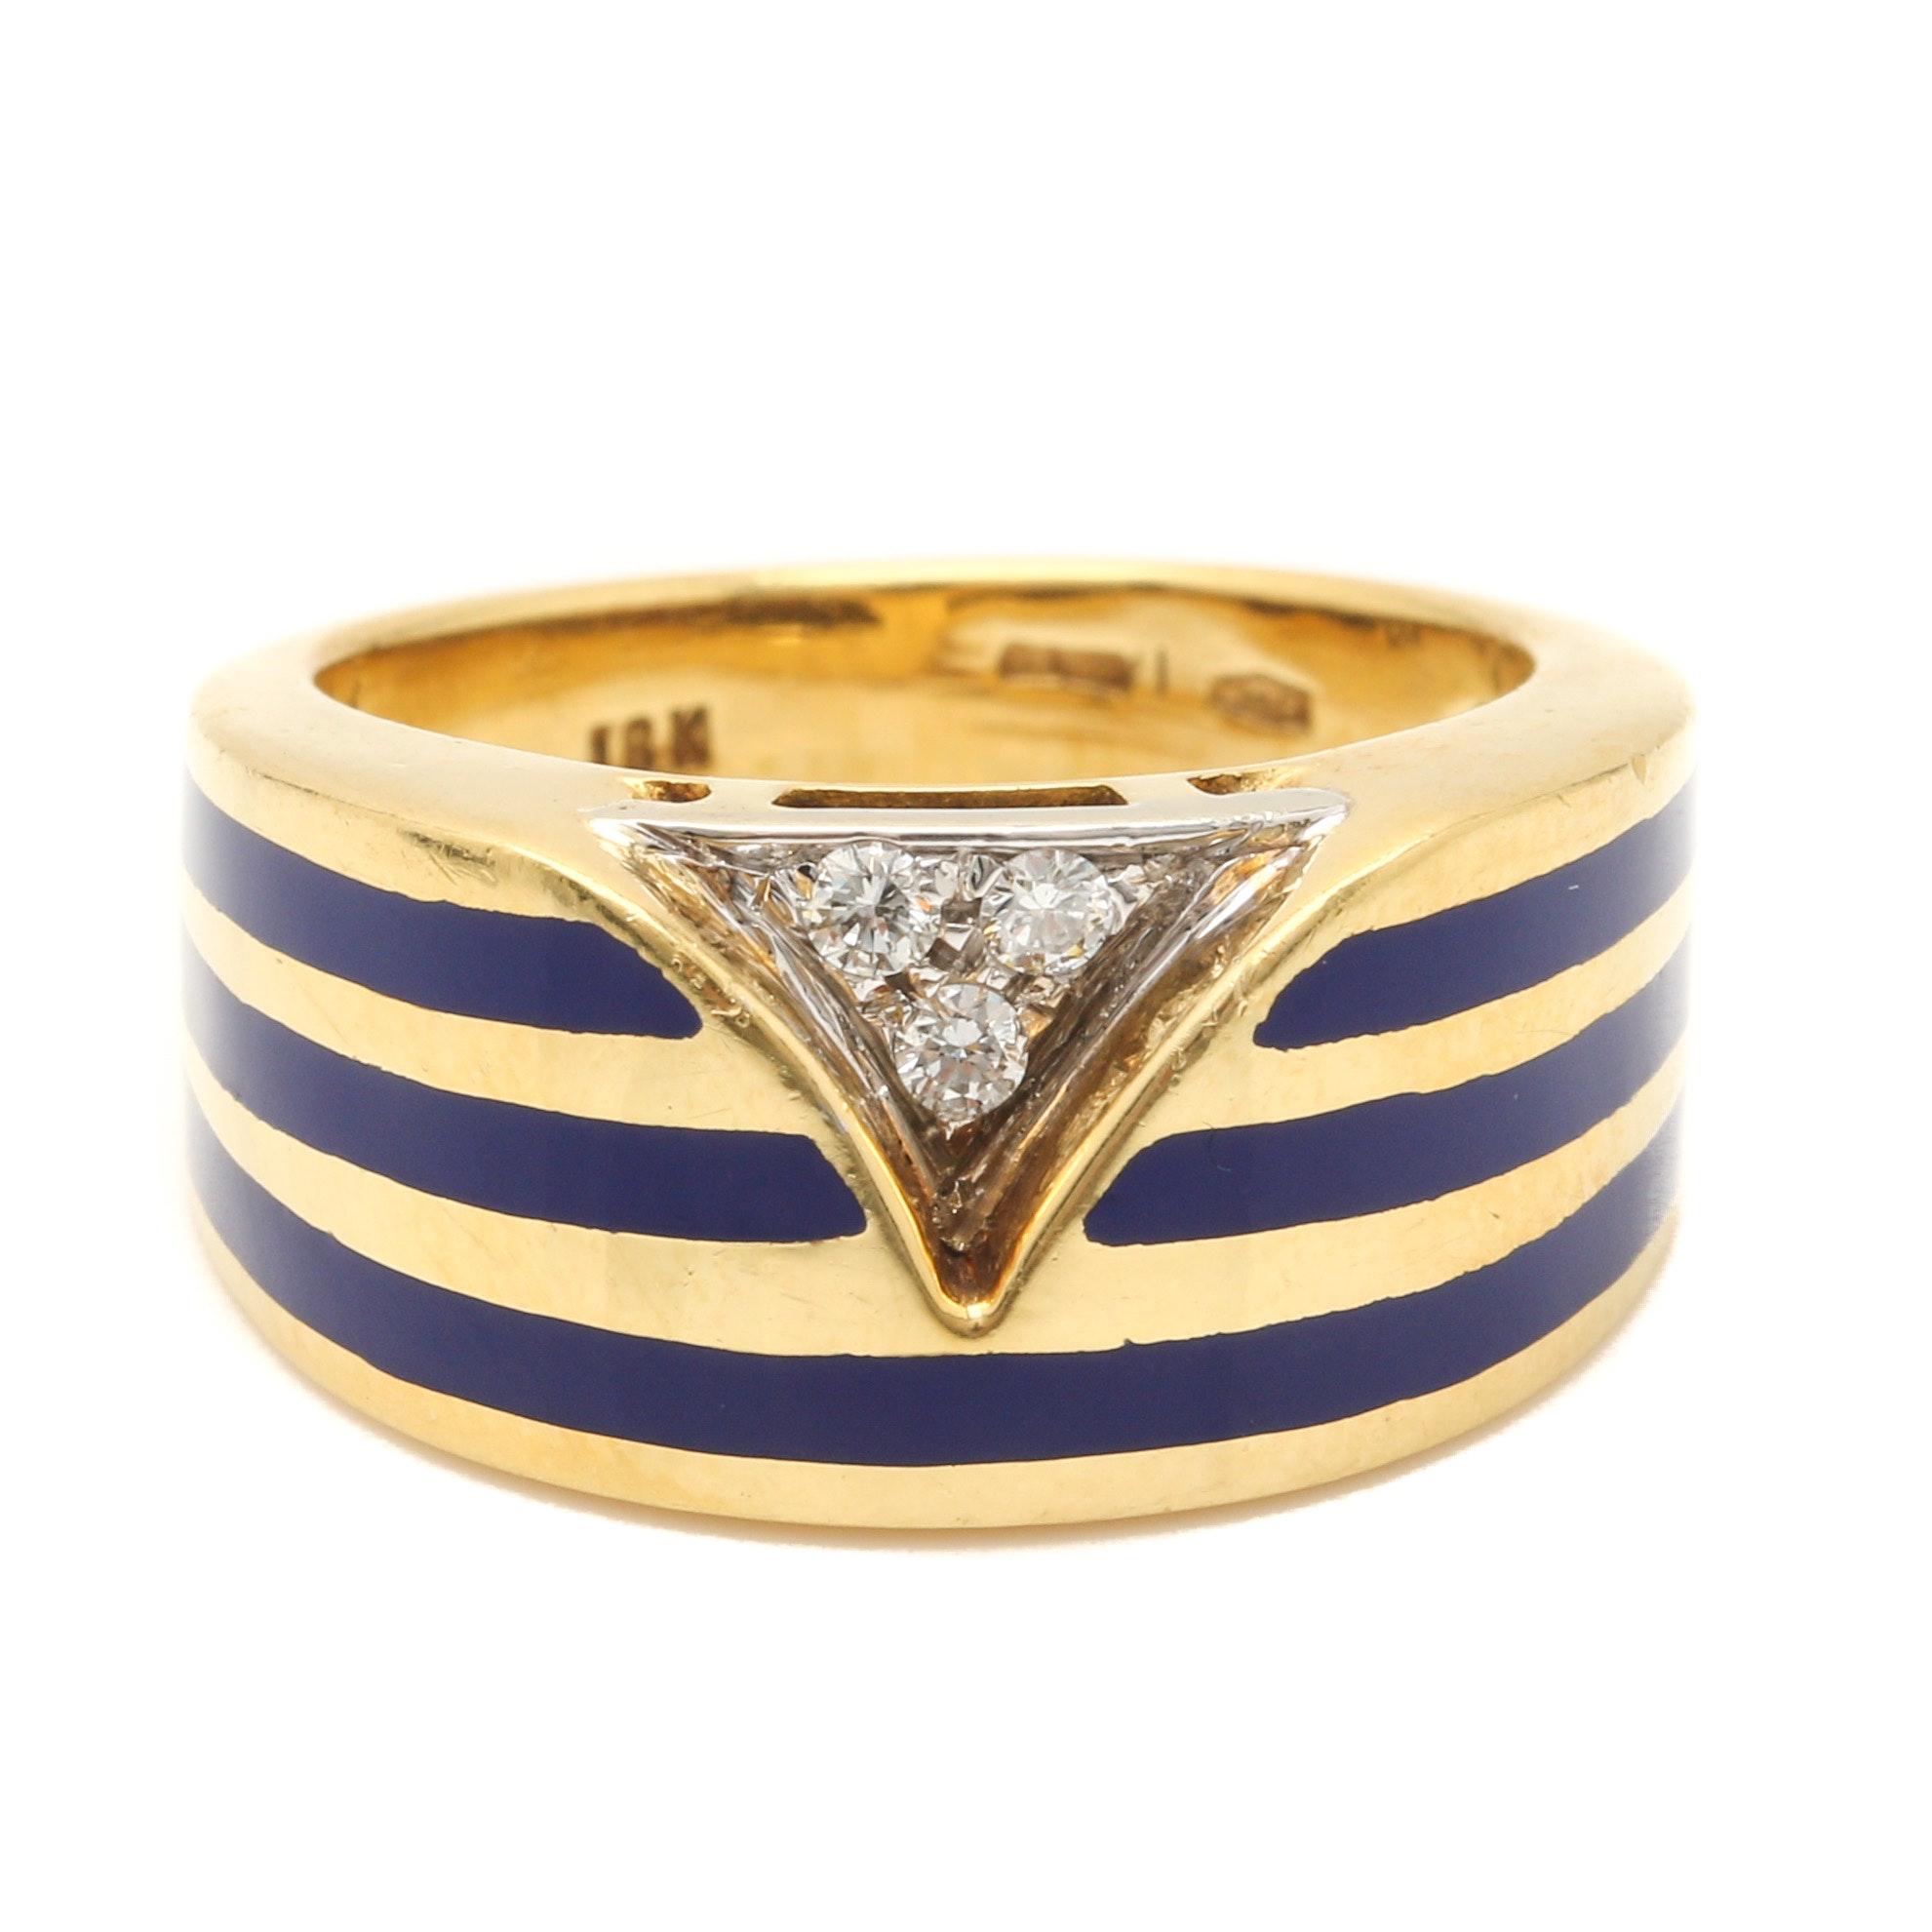 Italian 18K Yellow Gold Diamond and Blue Enamel Ring